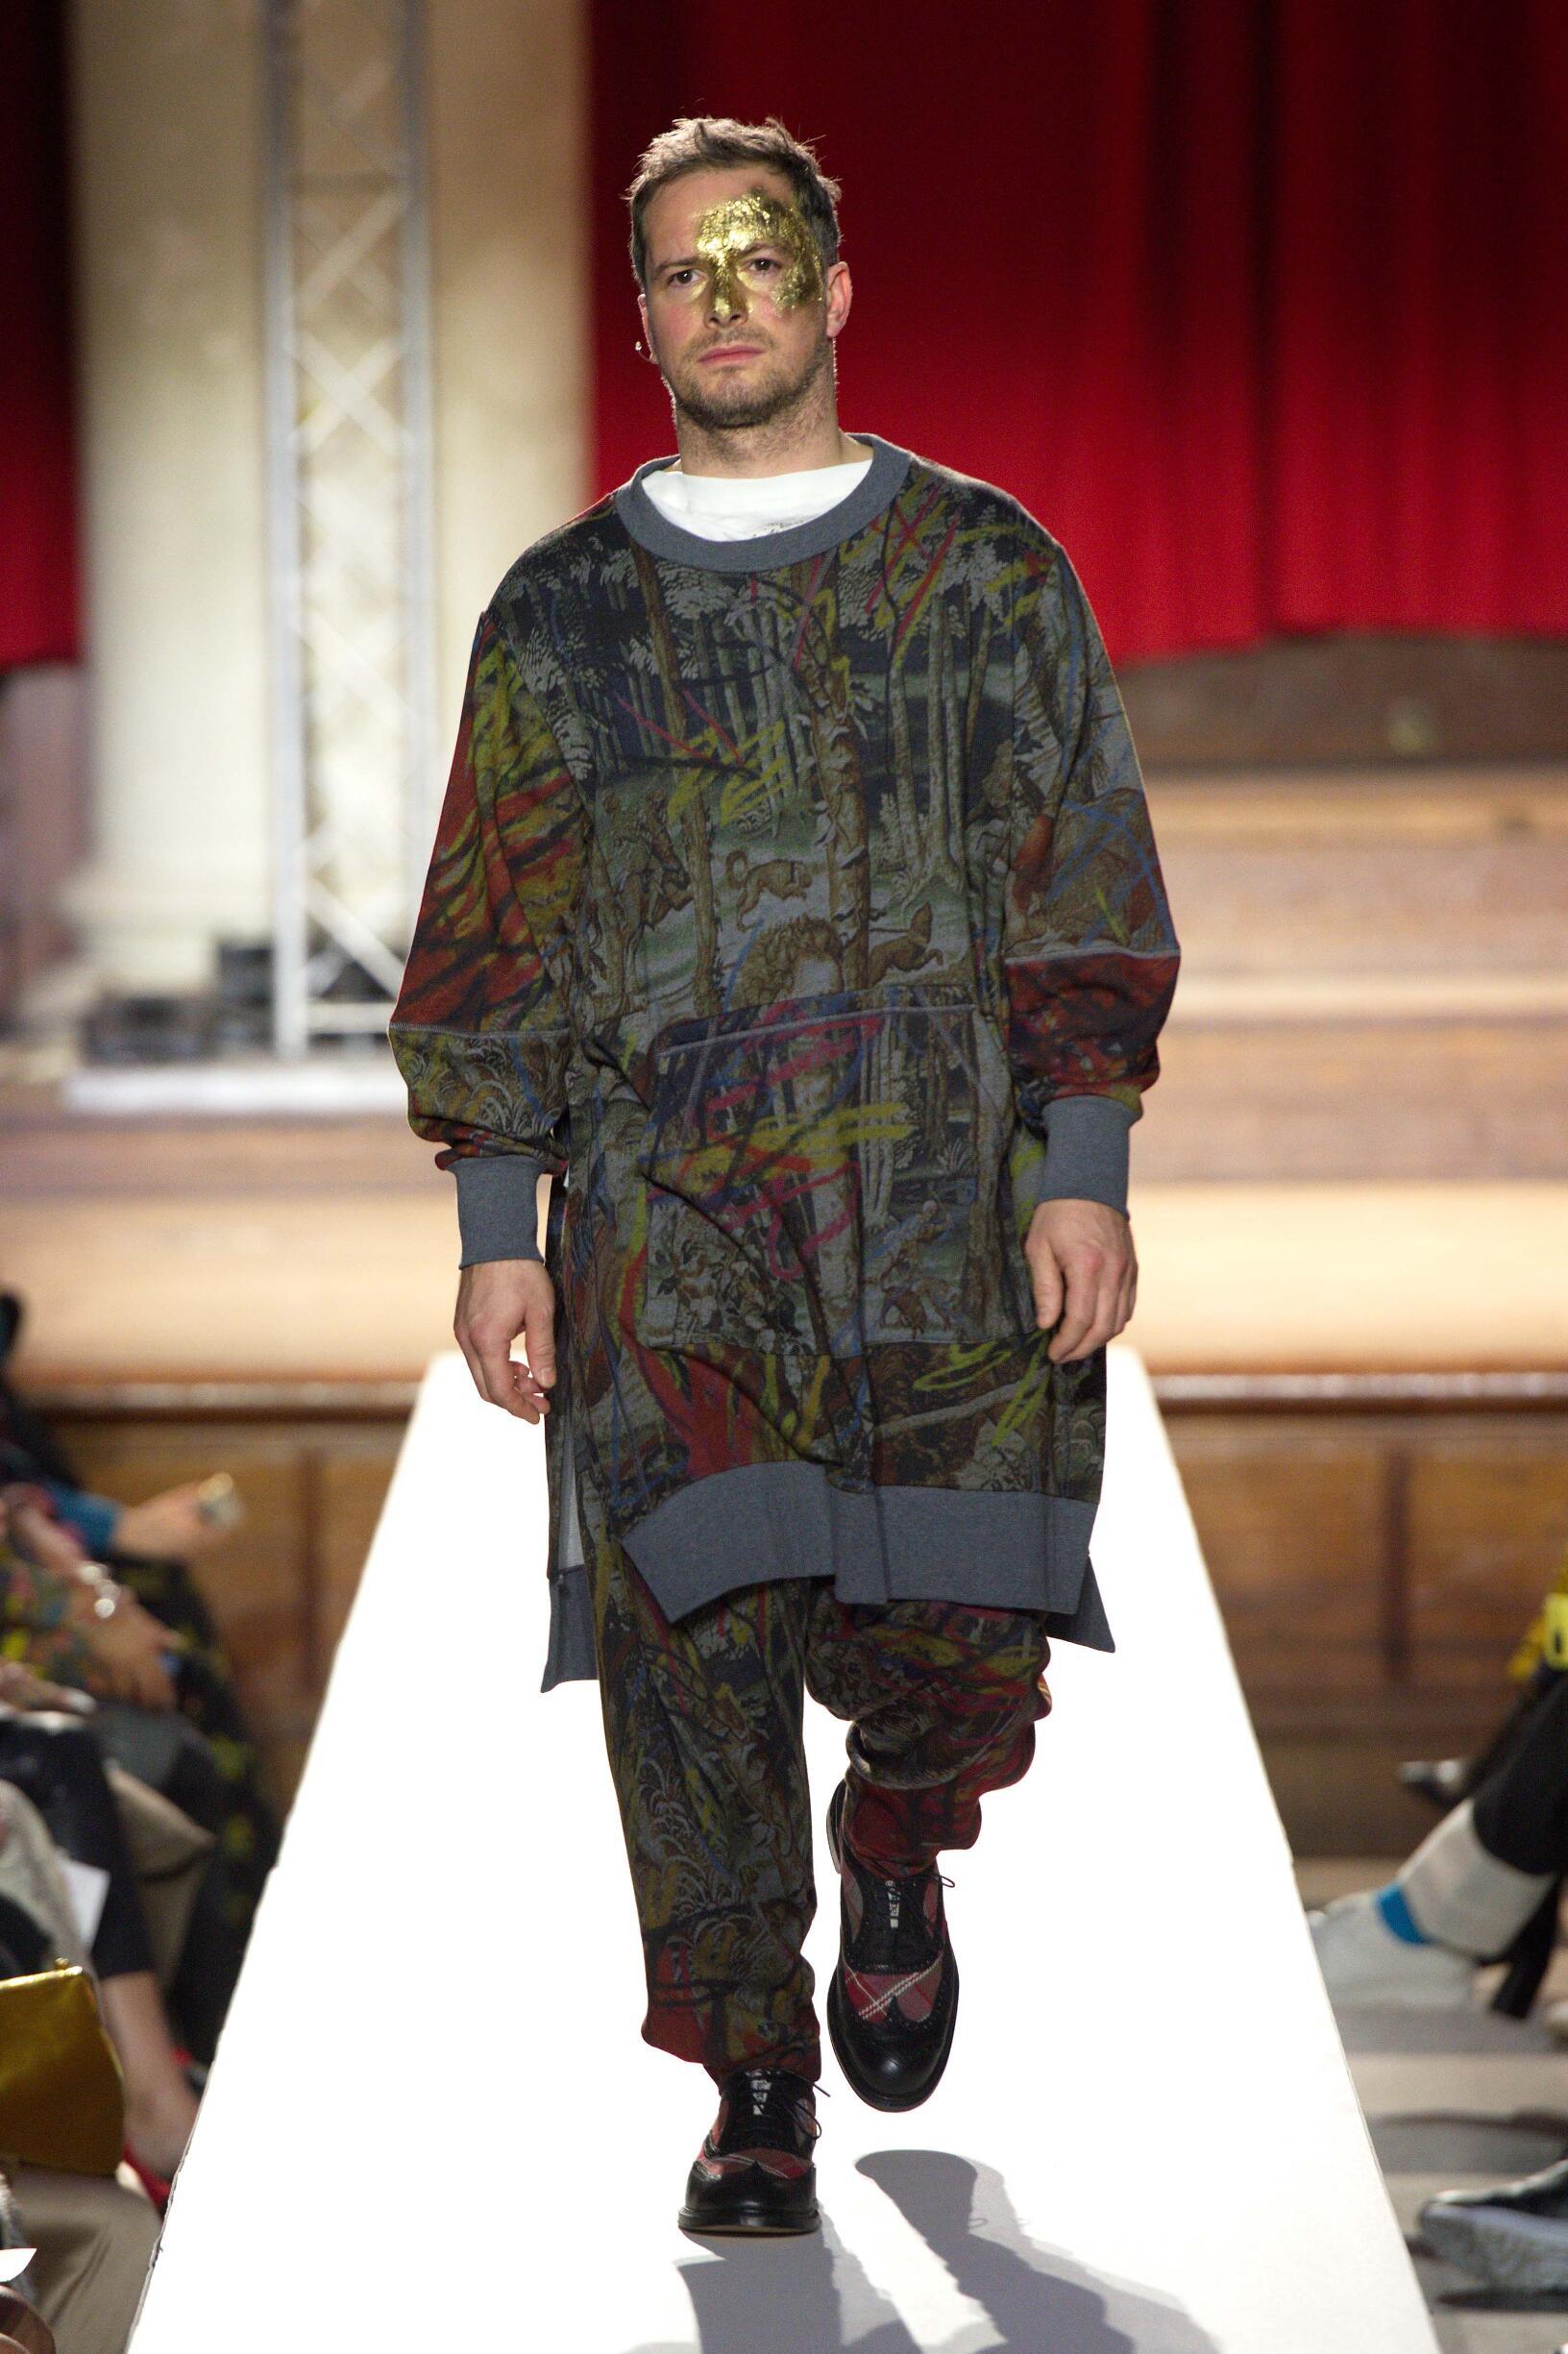 Man FW 2019 Vivienne Westwood Show London Fashion Week